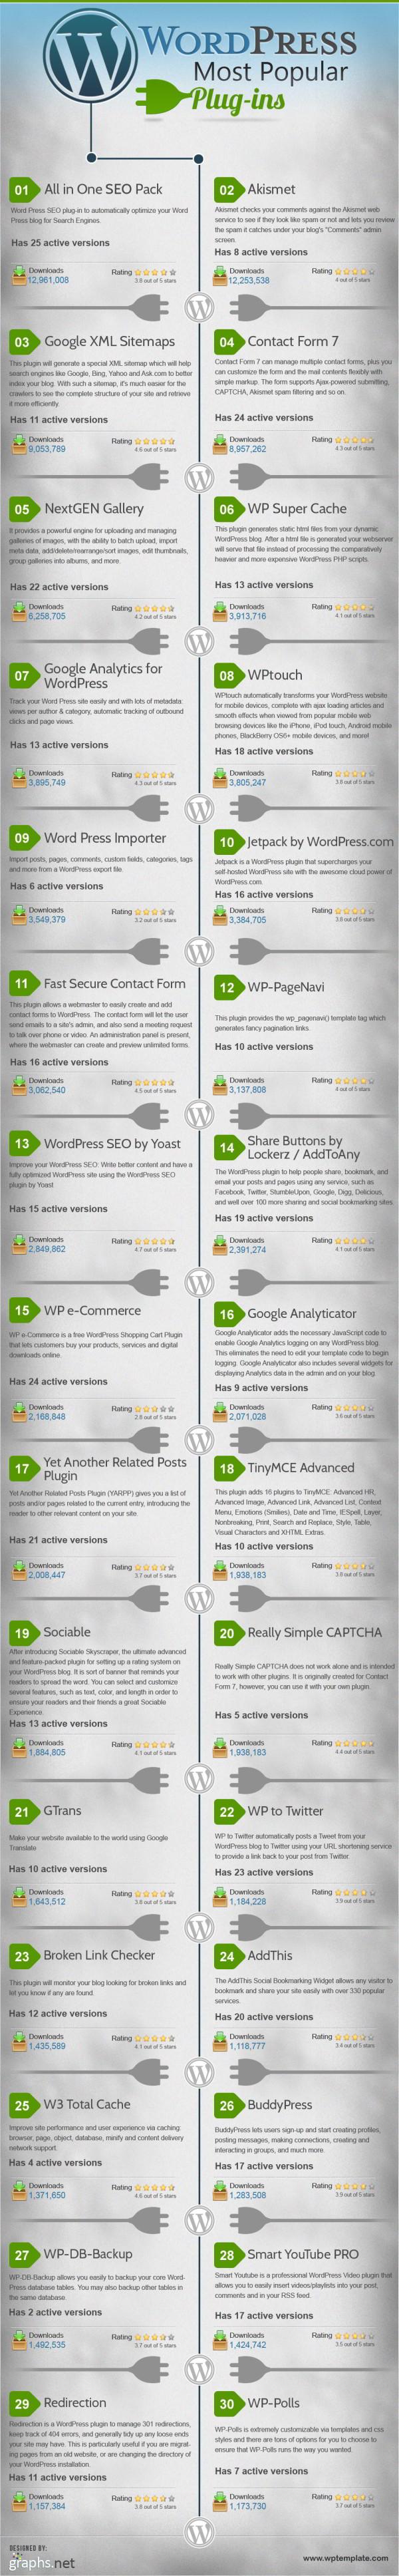 WordPress : les plugins les plus populaires